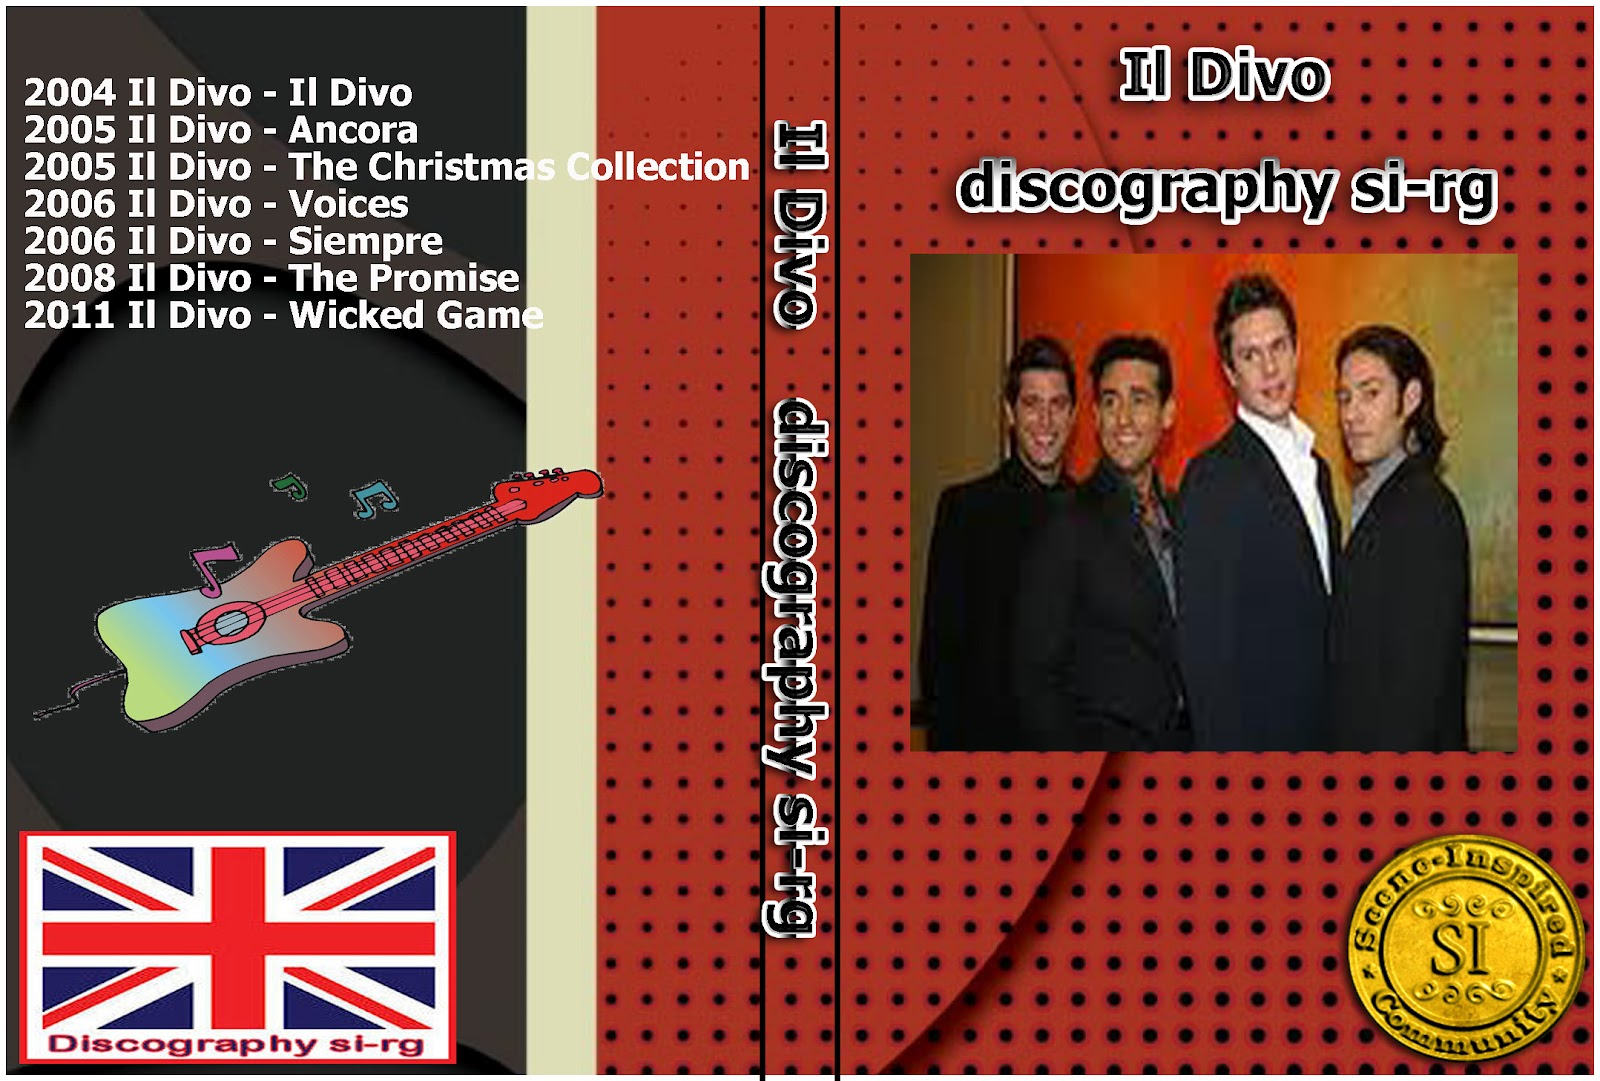 Si rg goldenbar july 2012 - Il divo christmas album ...